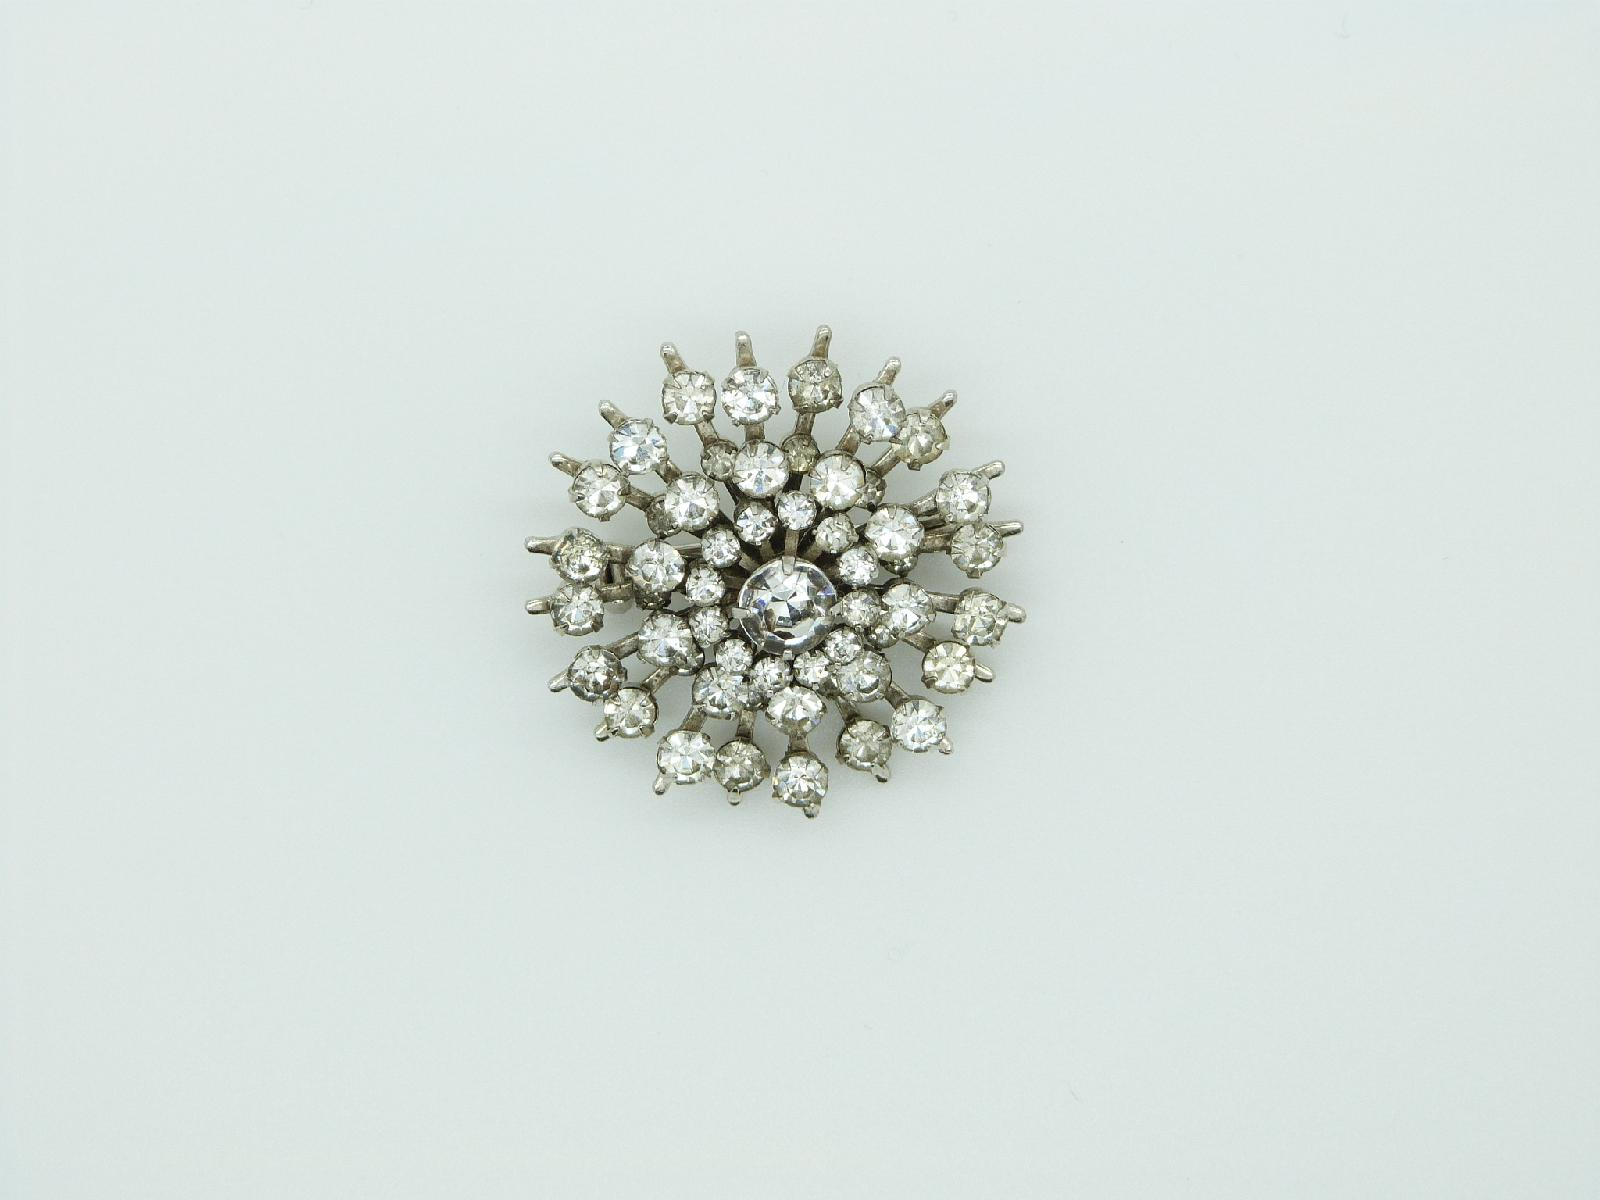 £23.00 - Vintage 40s Quality Sparkling Diamante Starburst Design Silvertone Brooch